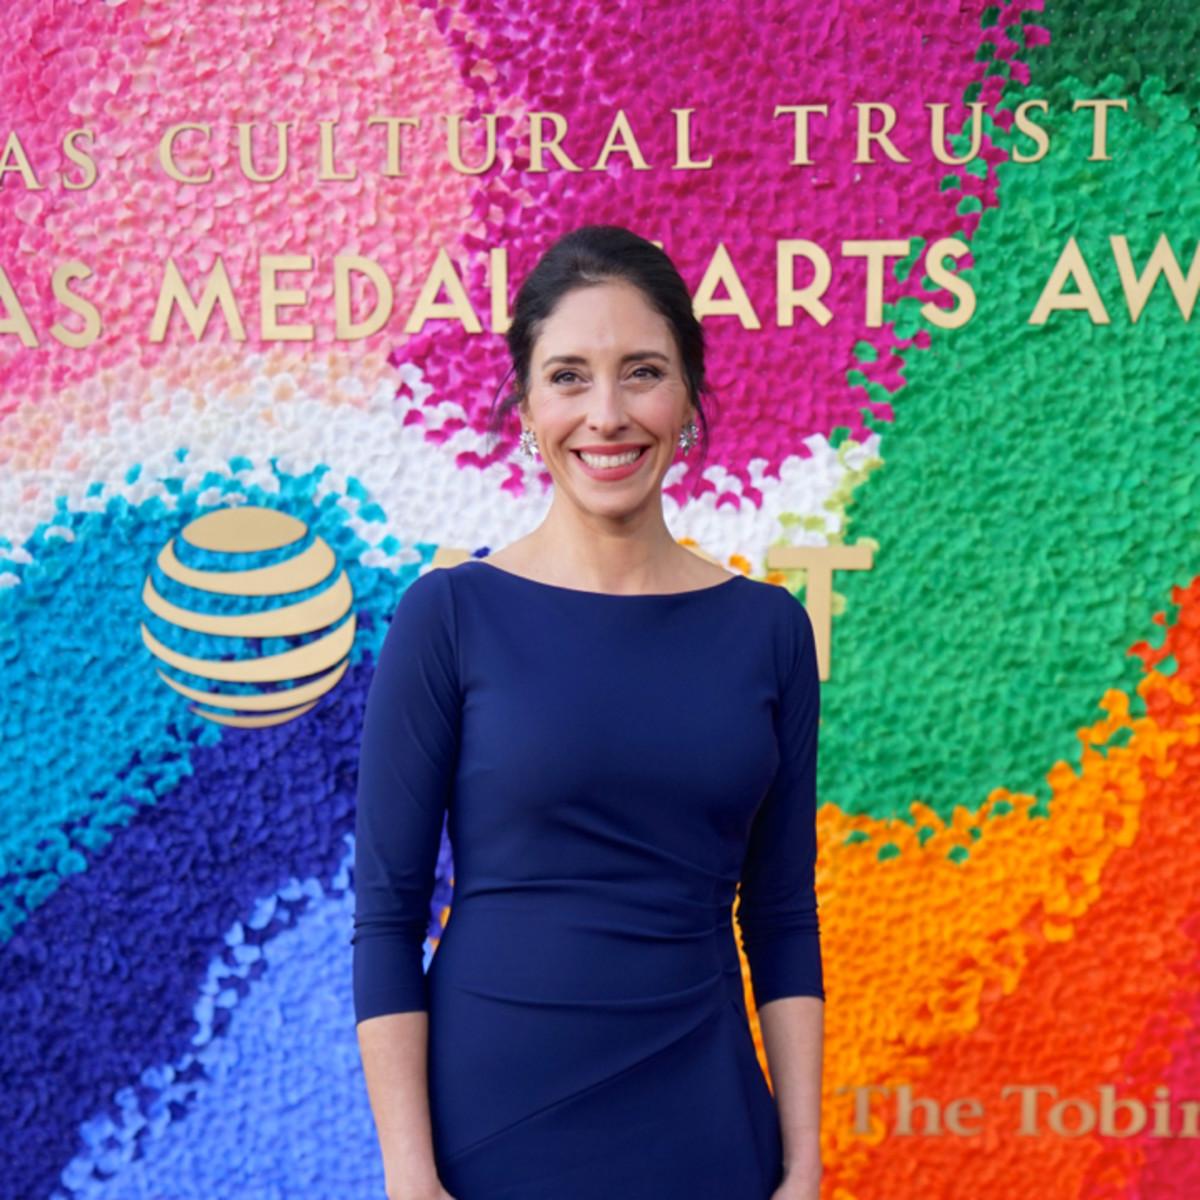 2019 Texas Medal of Art Awards Heidi Marquez Smith